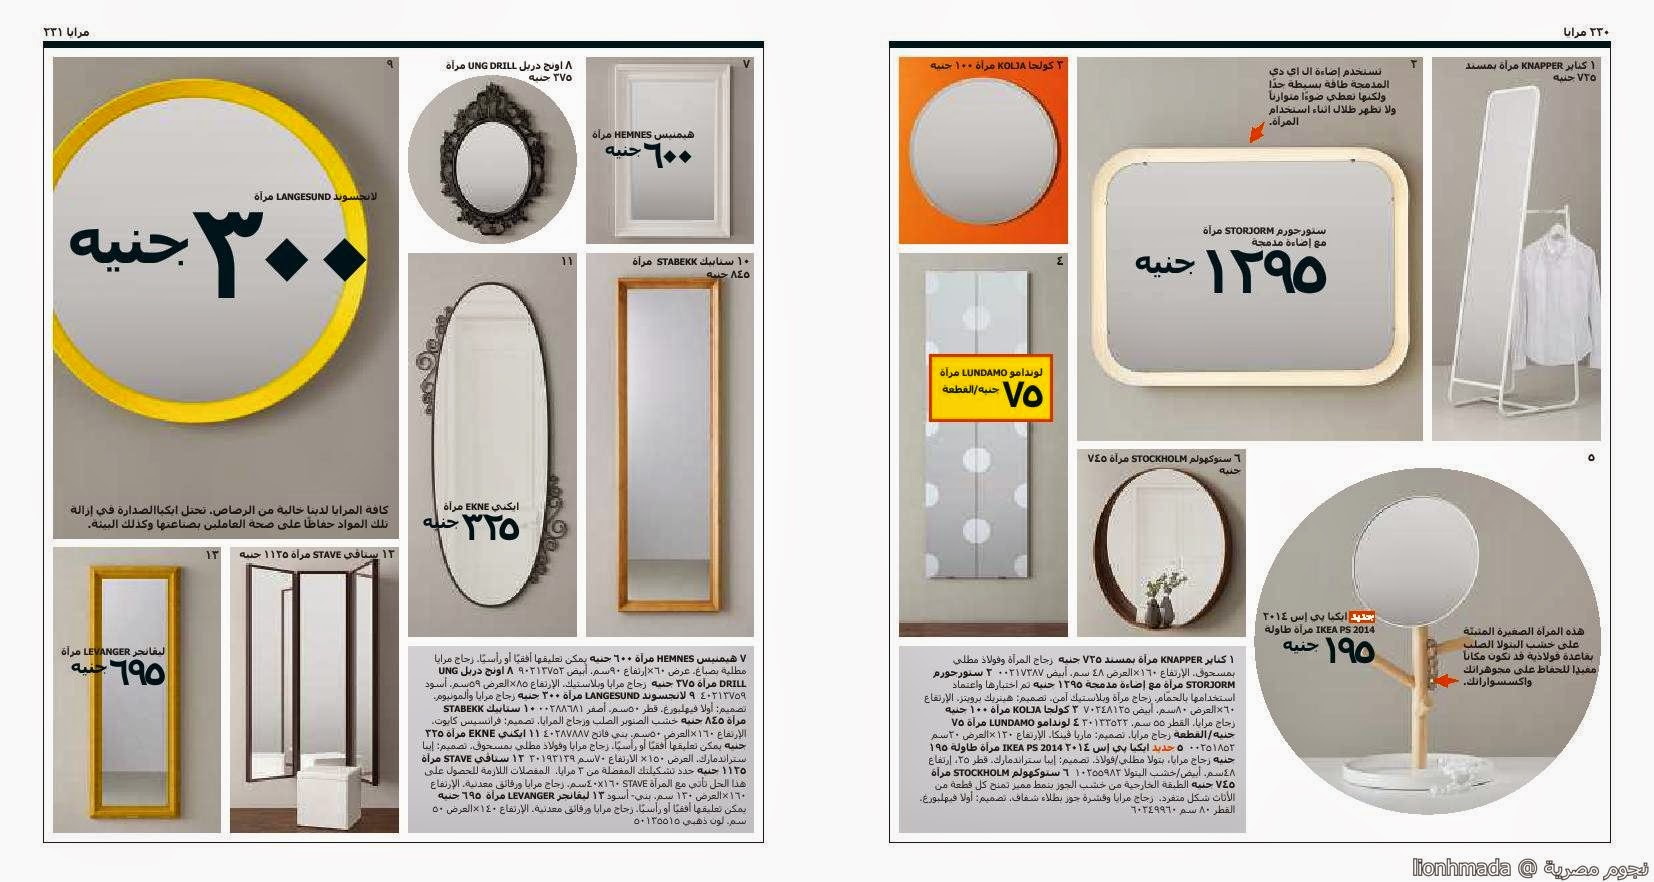 img2af5a203d5ead4a65c5466c98a28579a صور كتالوج ايكيا مصر ikia للديكورات